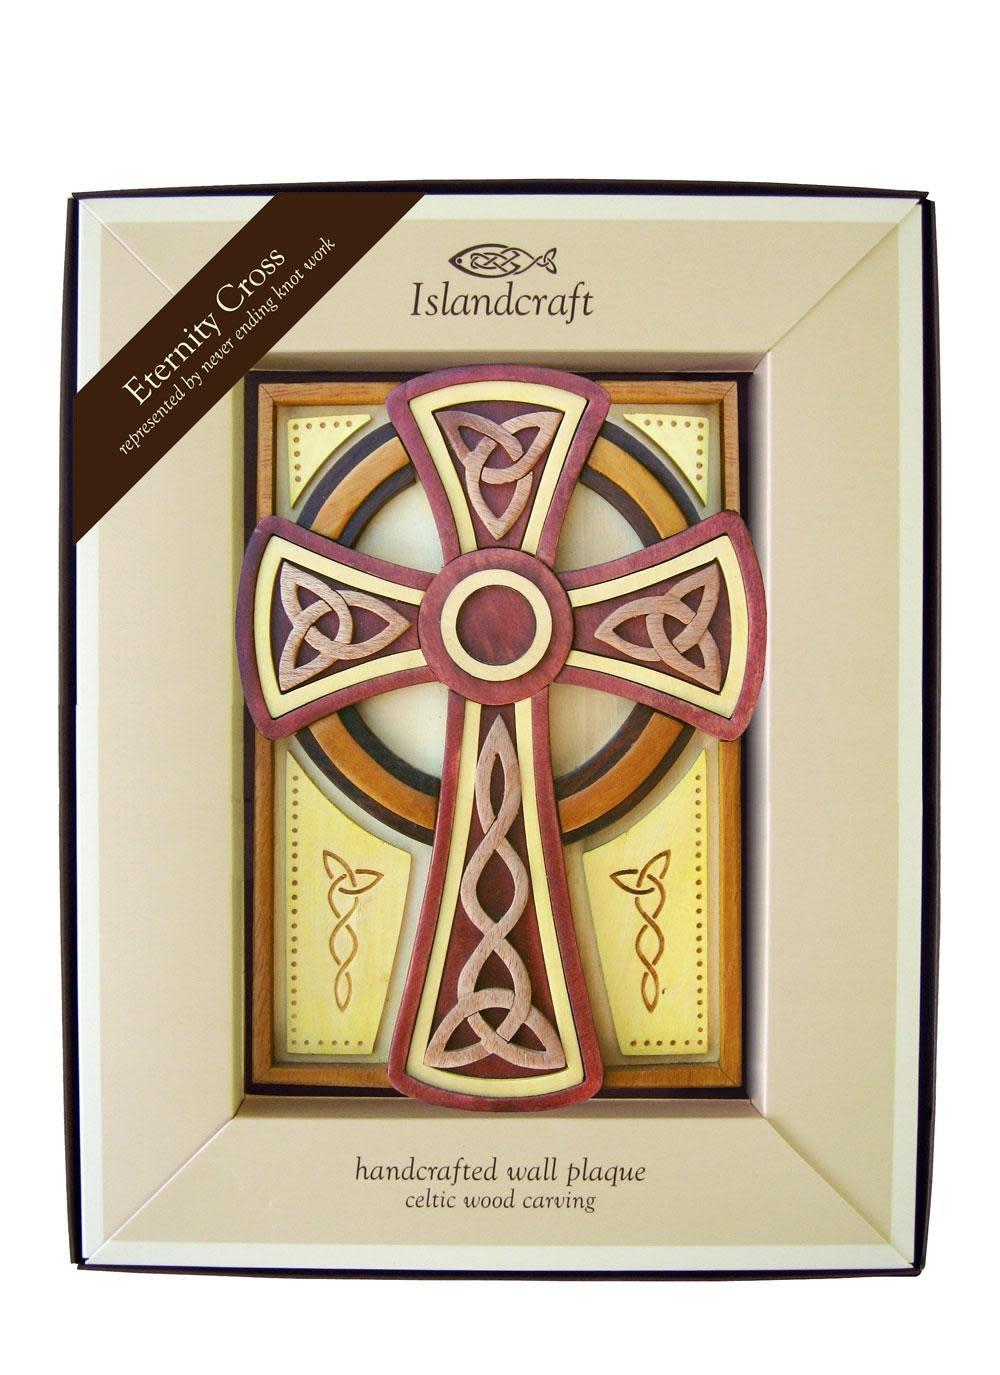 Clara Plaque: The Eternity Cross